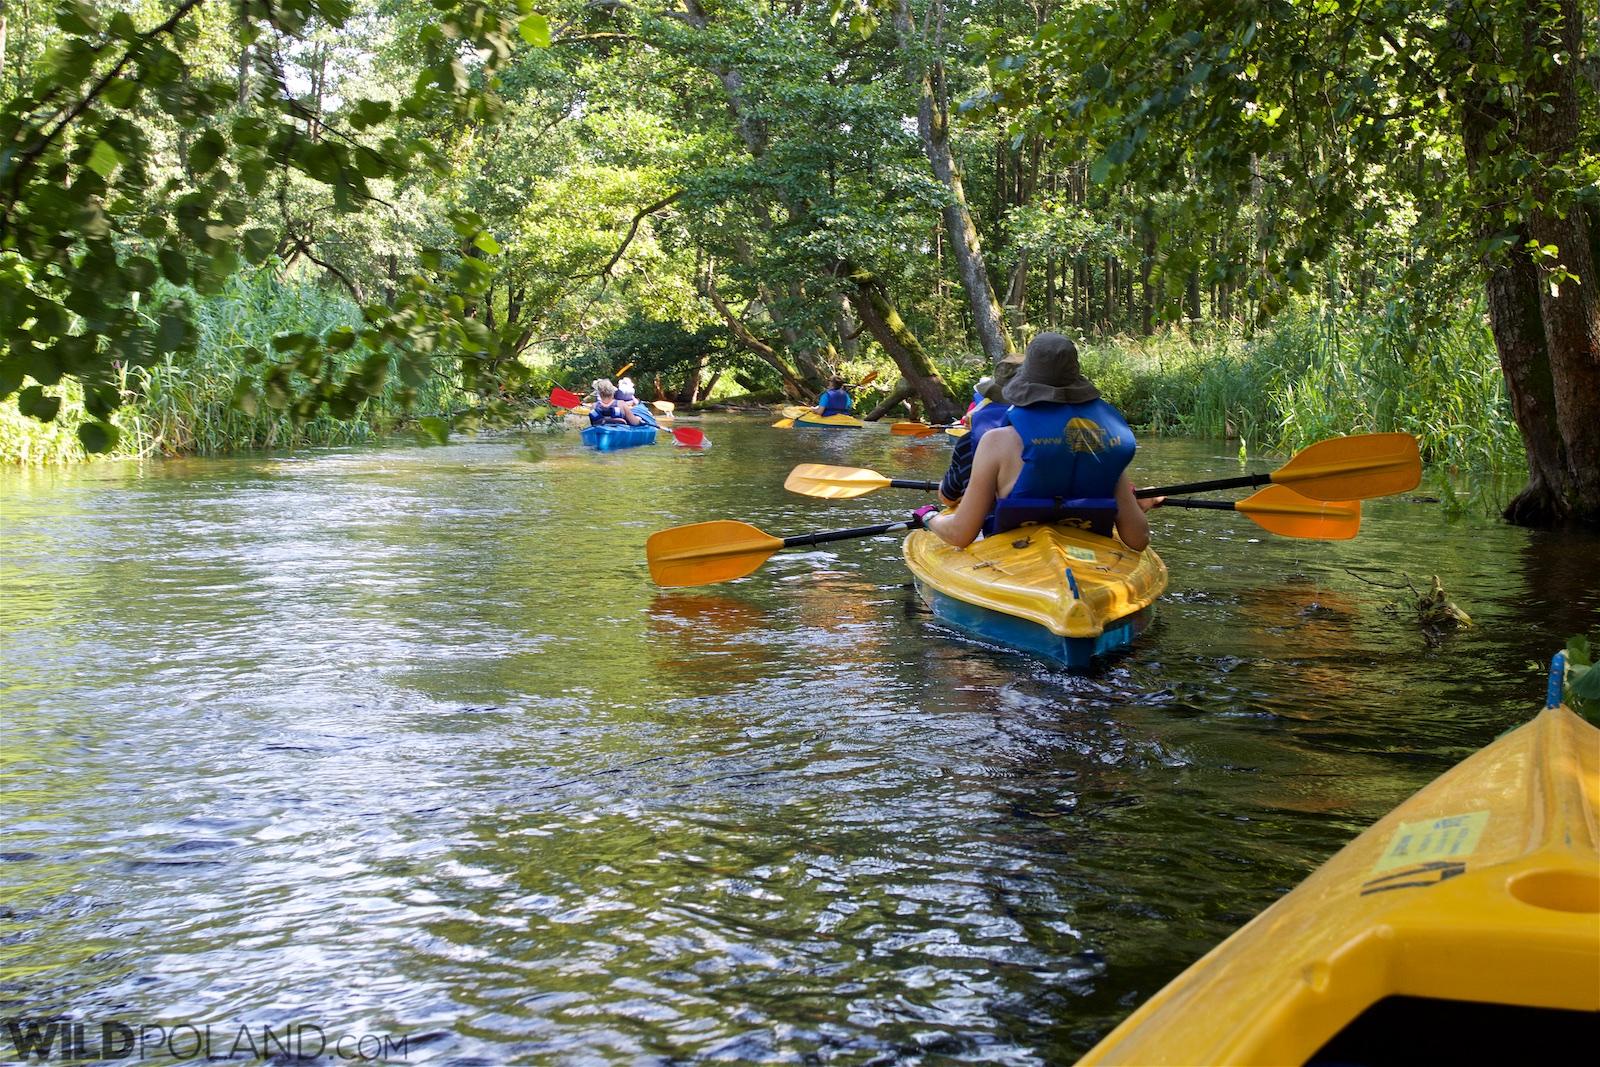 Kayaking on the Czarna Hańcza River